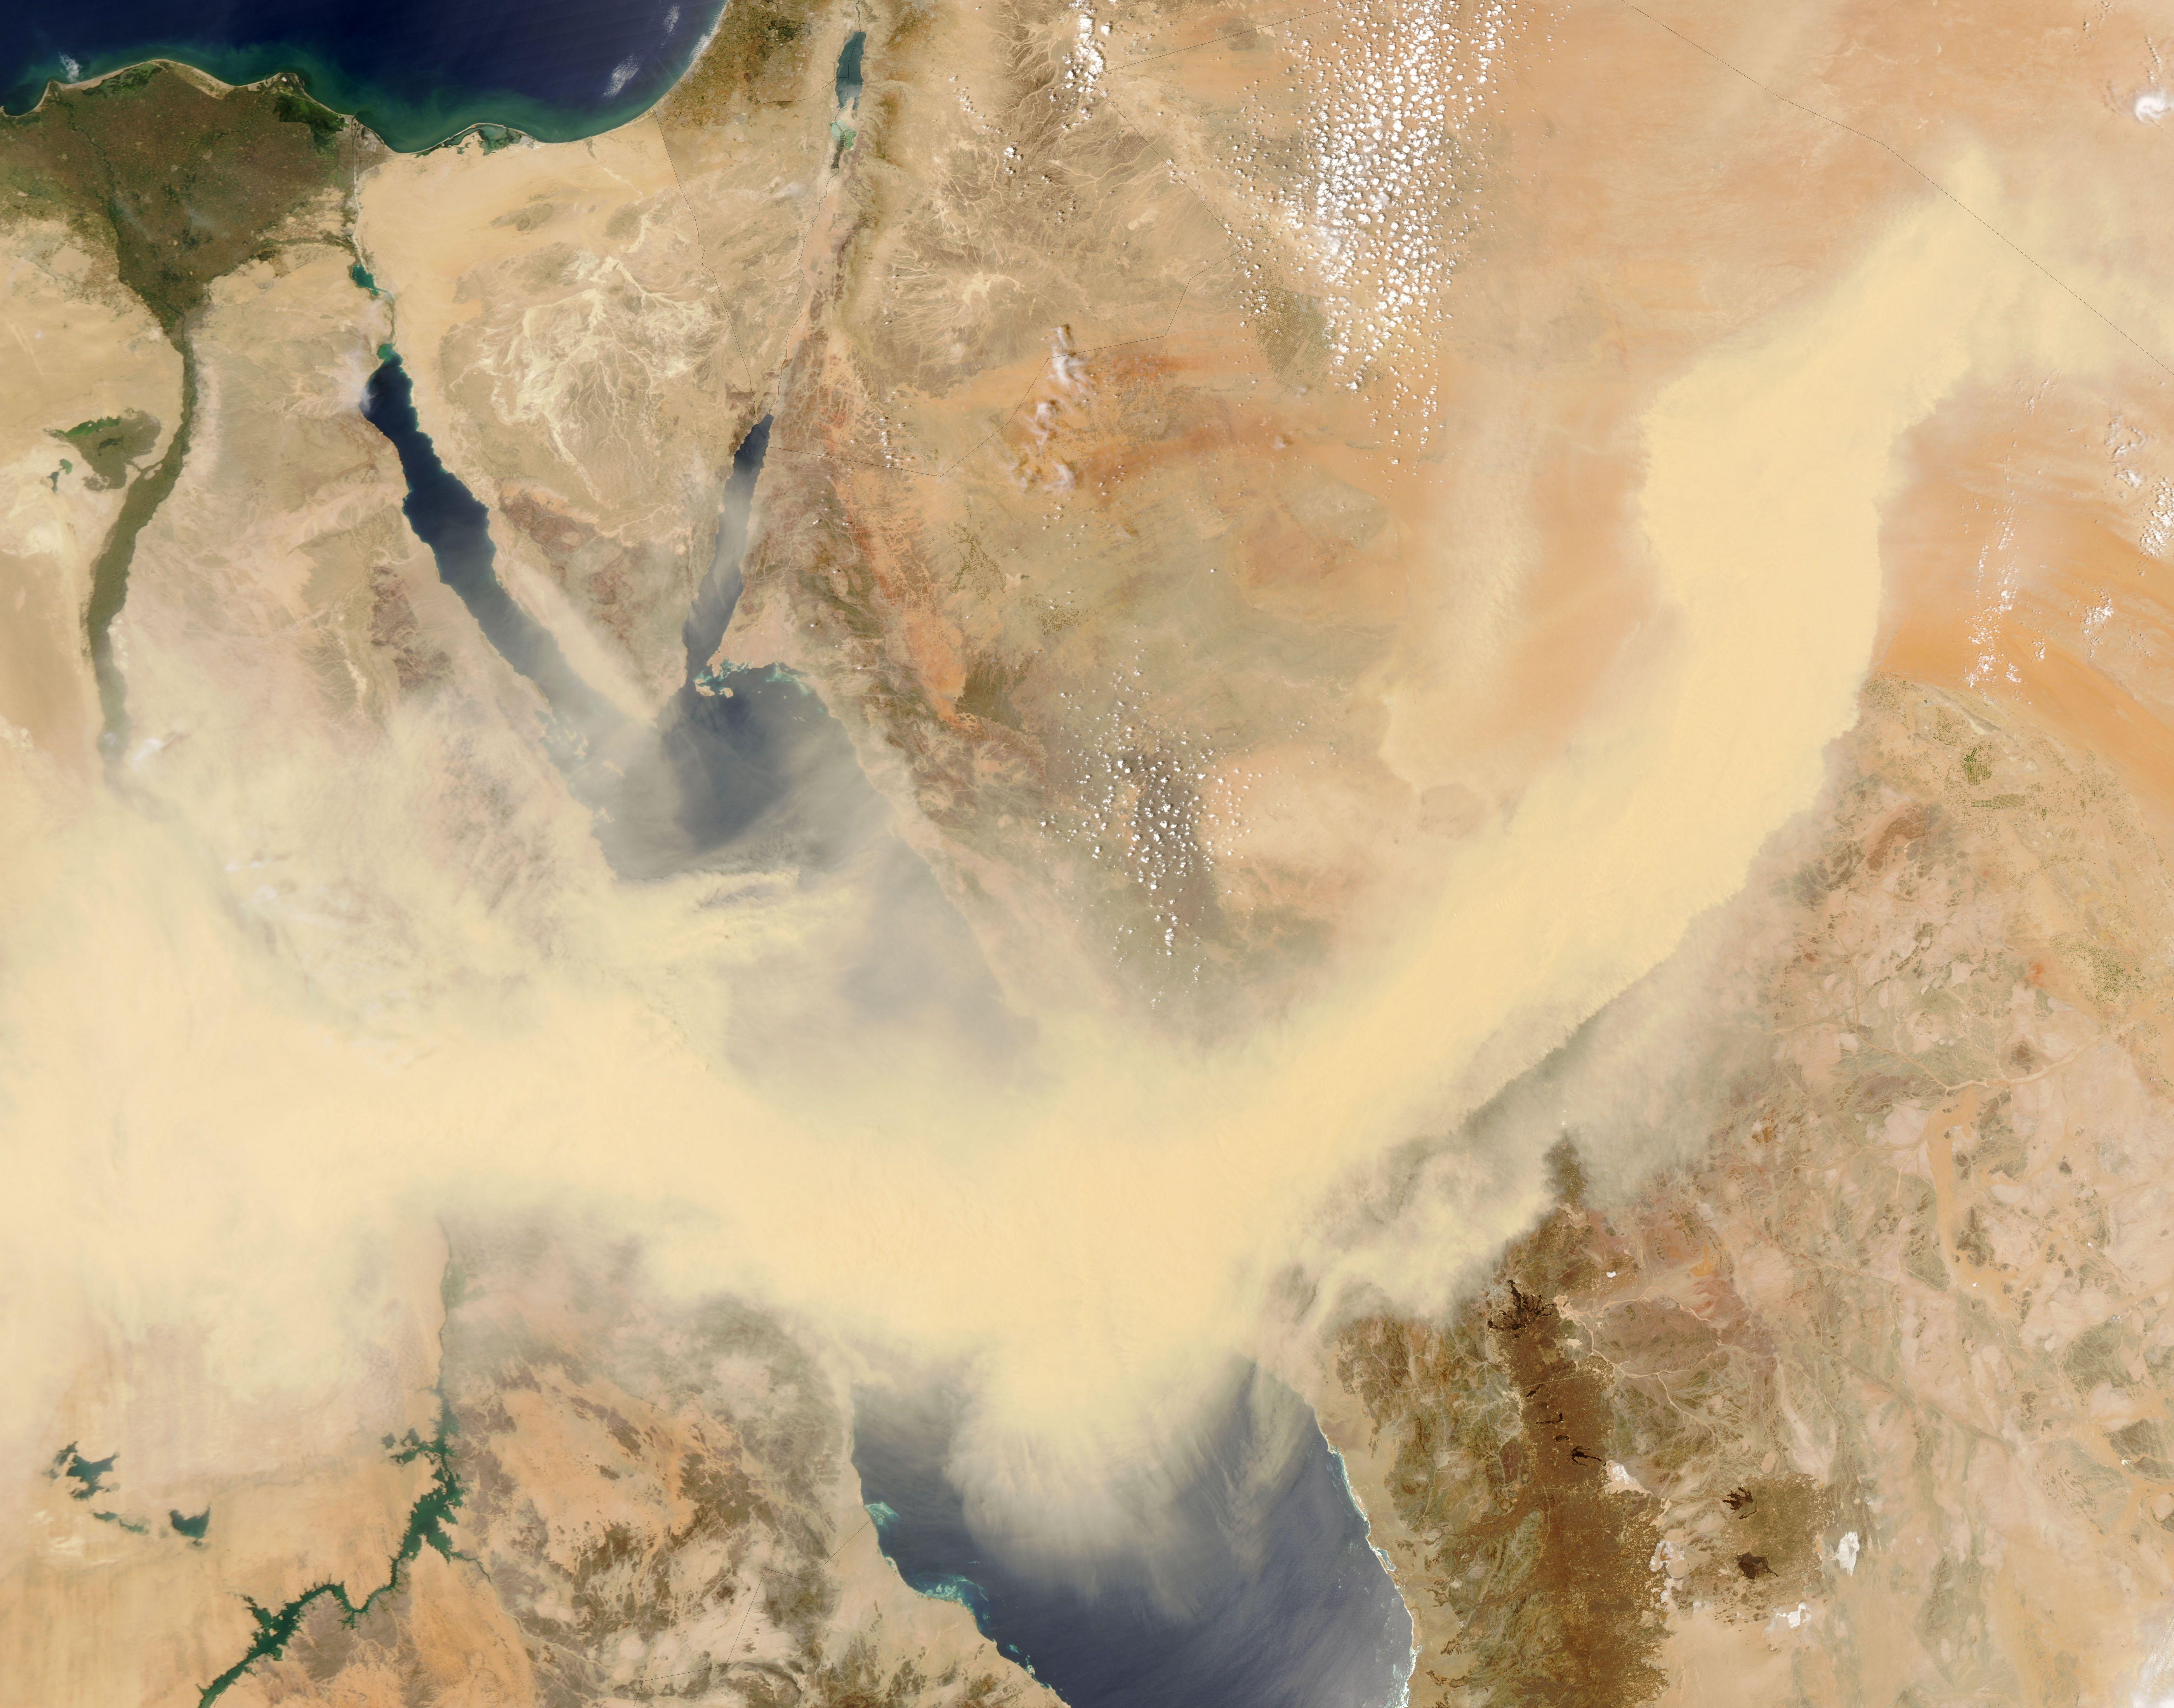 http://upload.wikimedia.org/wikipedia/commons/9/99/Redsea_sandstorm_May13-2005.jpg